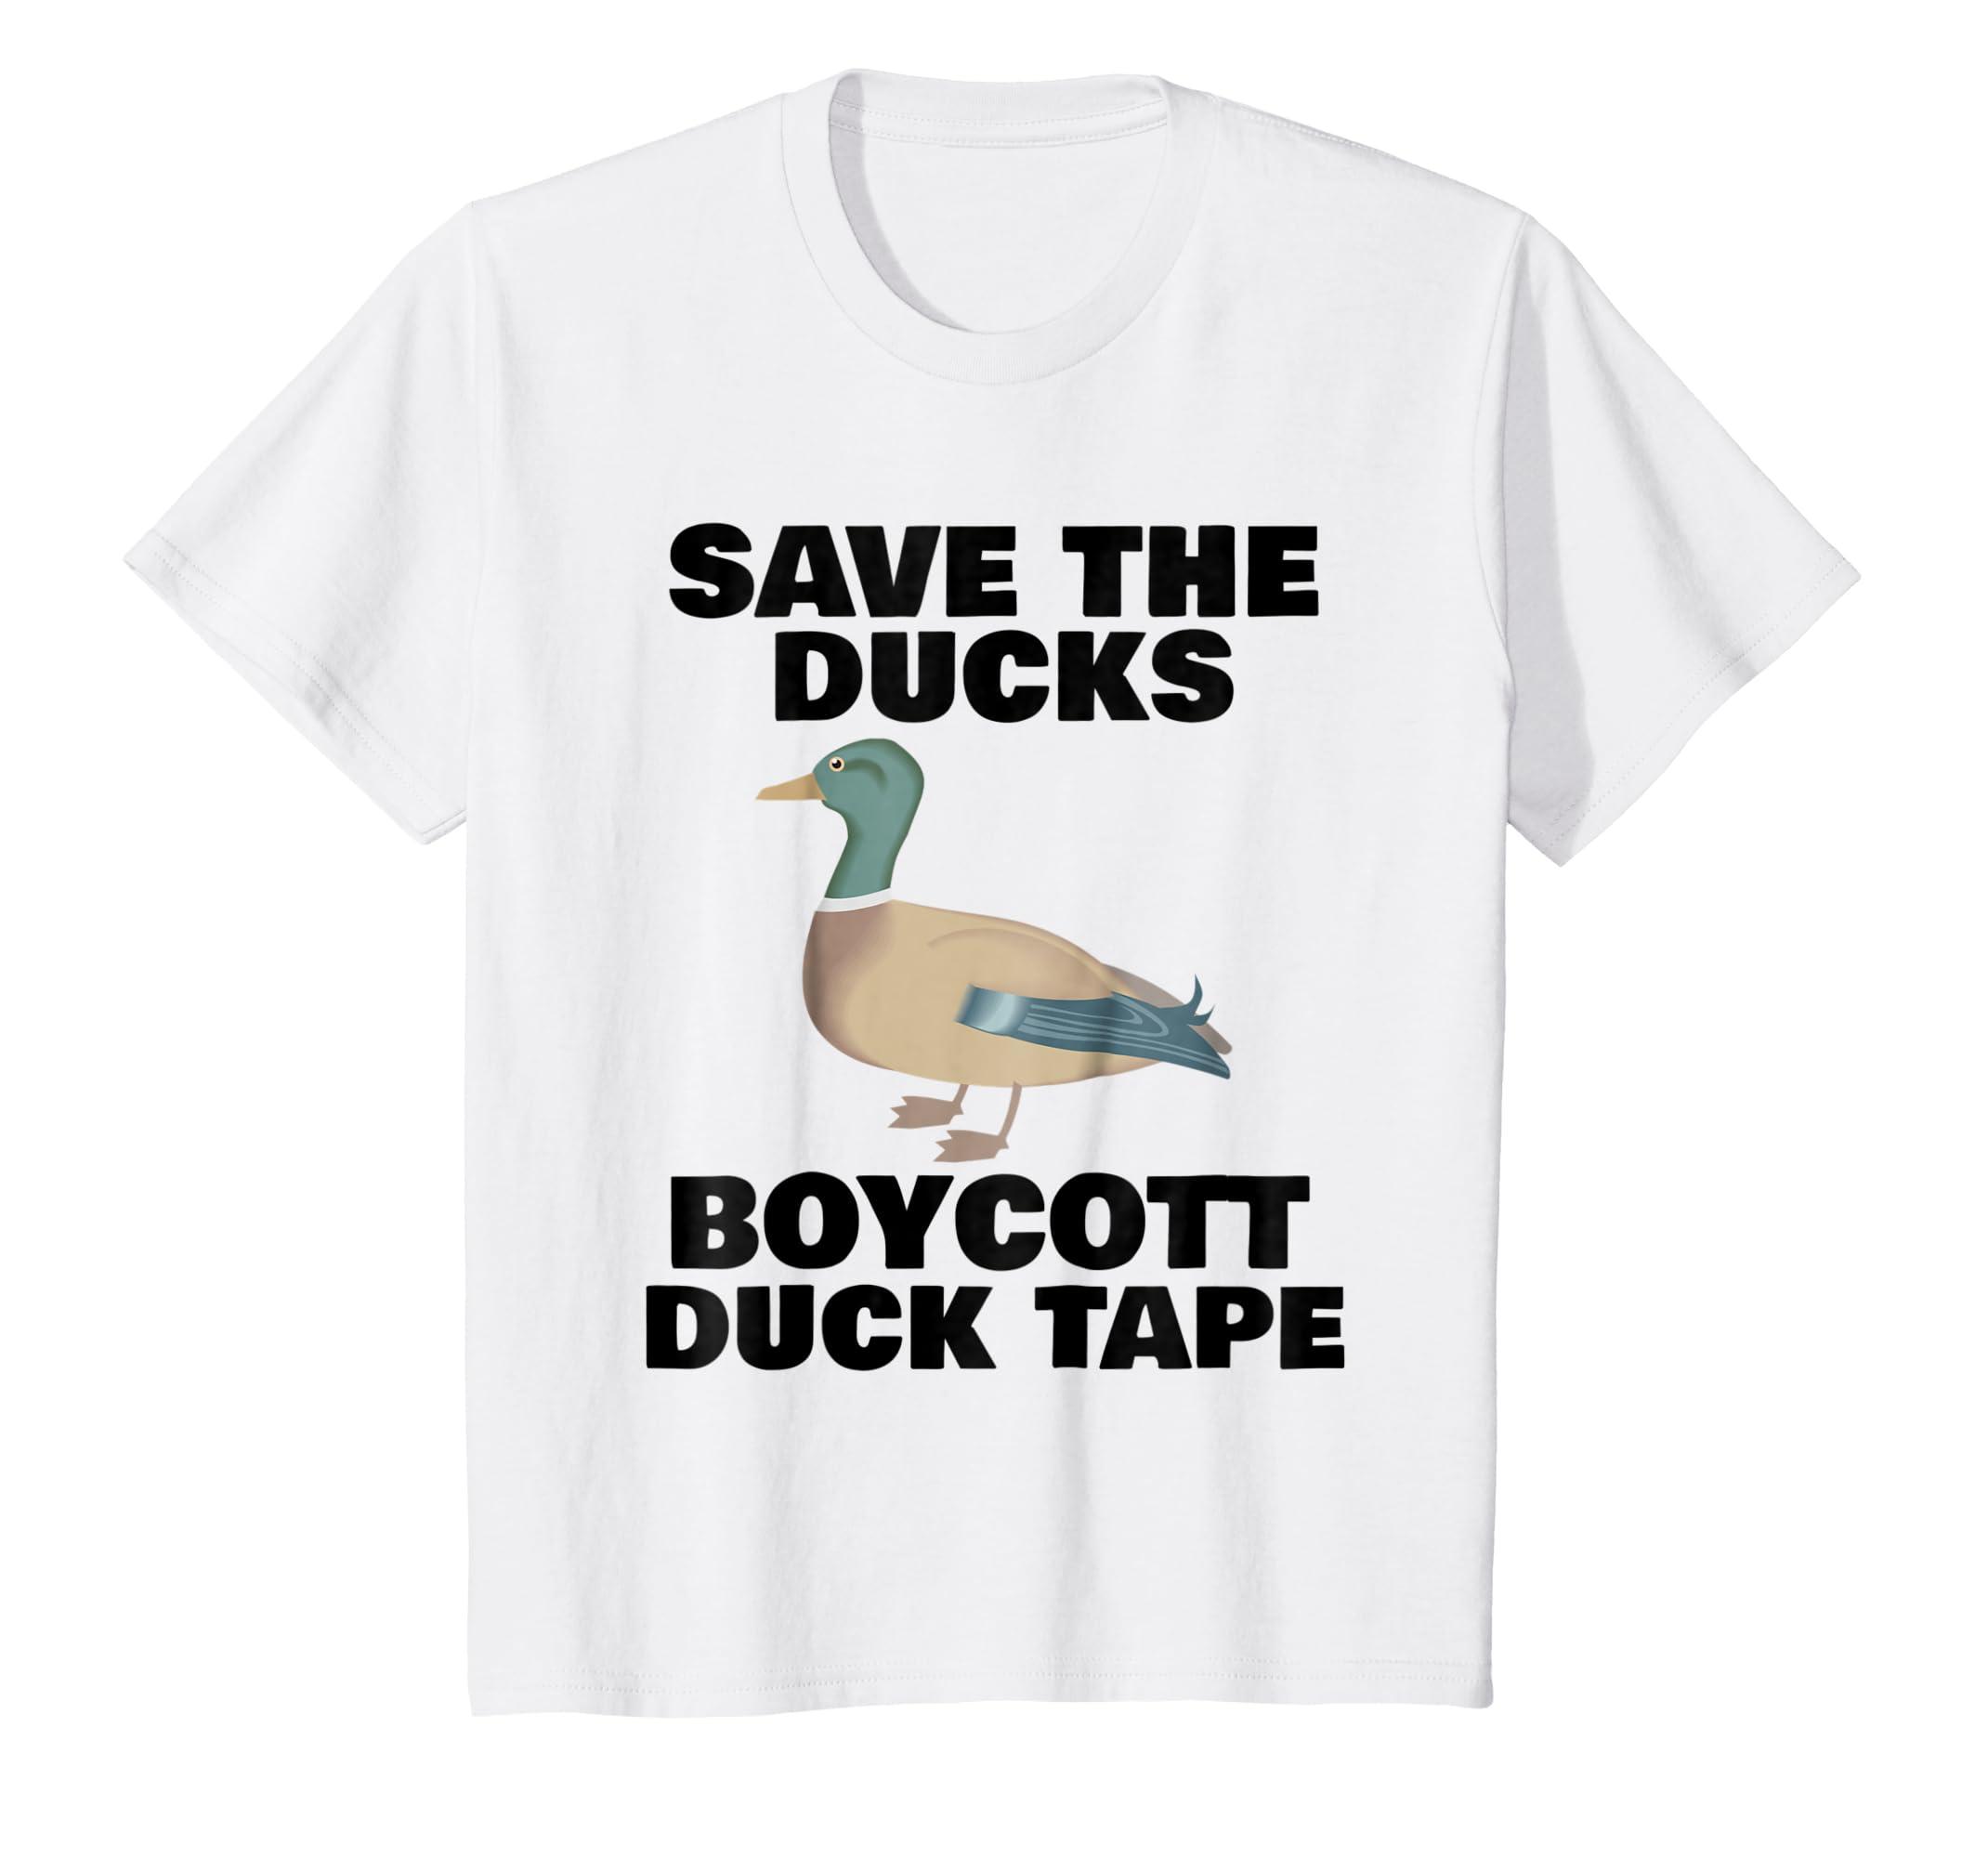 promo code afc14 08008 Amazon.com: Save the Ducks Boycott Duck Tape Funny T-Shirt ...